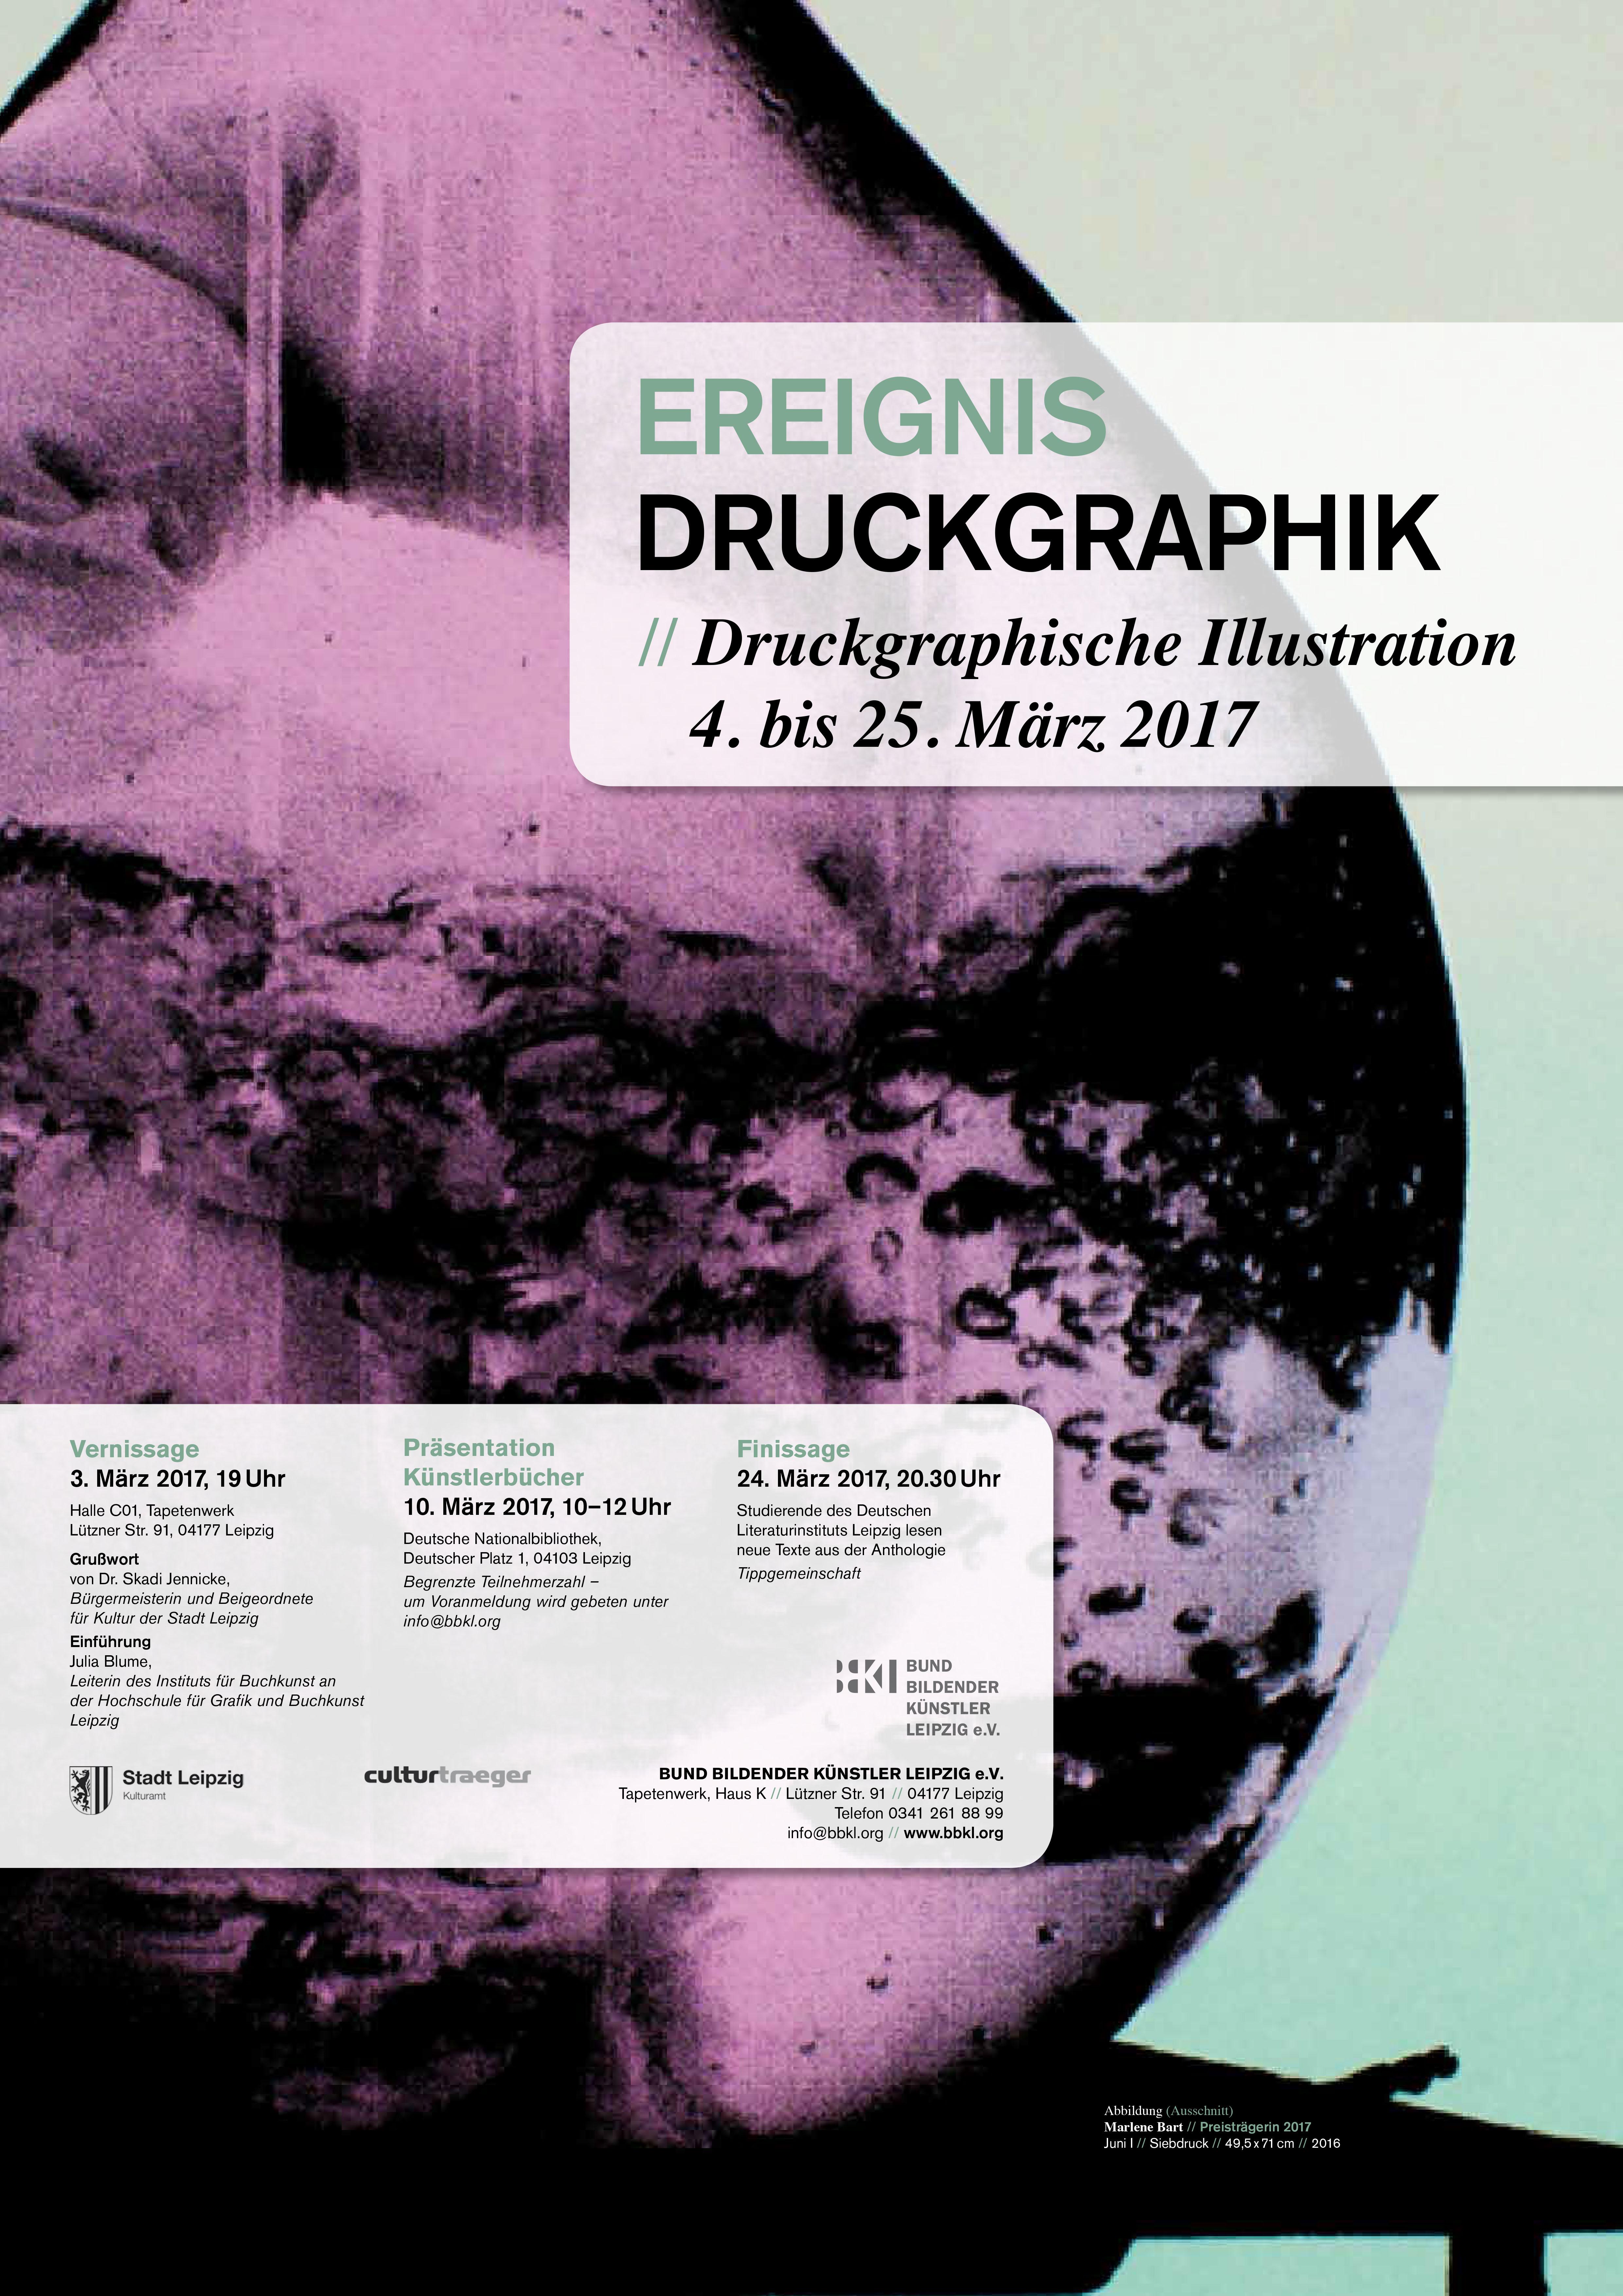 EREIGNIS DRUCKGRAPHIK 2017